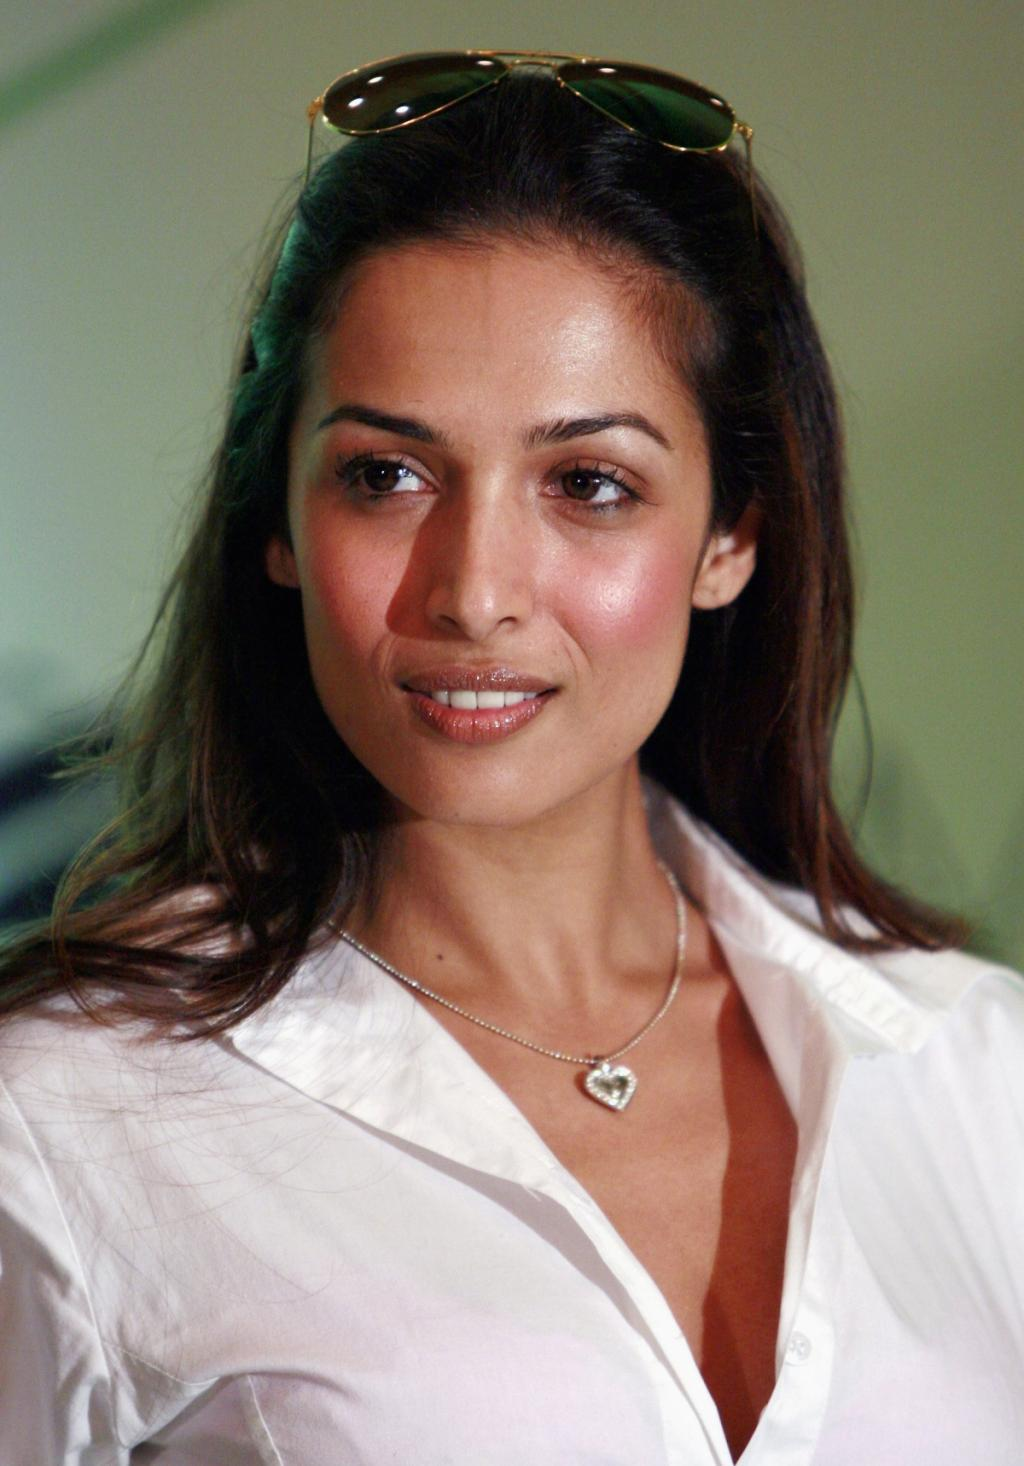 Malaika Arora Khan Arjun Kapoor Dating: Salman Khan's Sister-in-Law